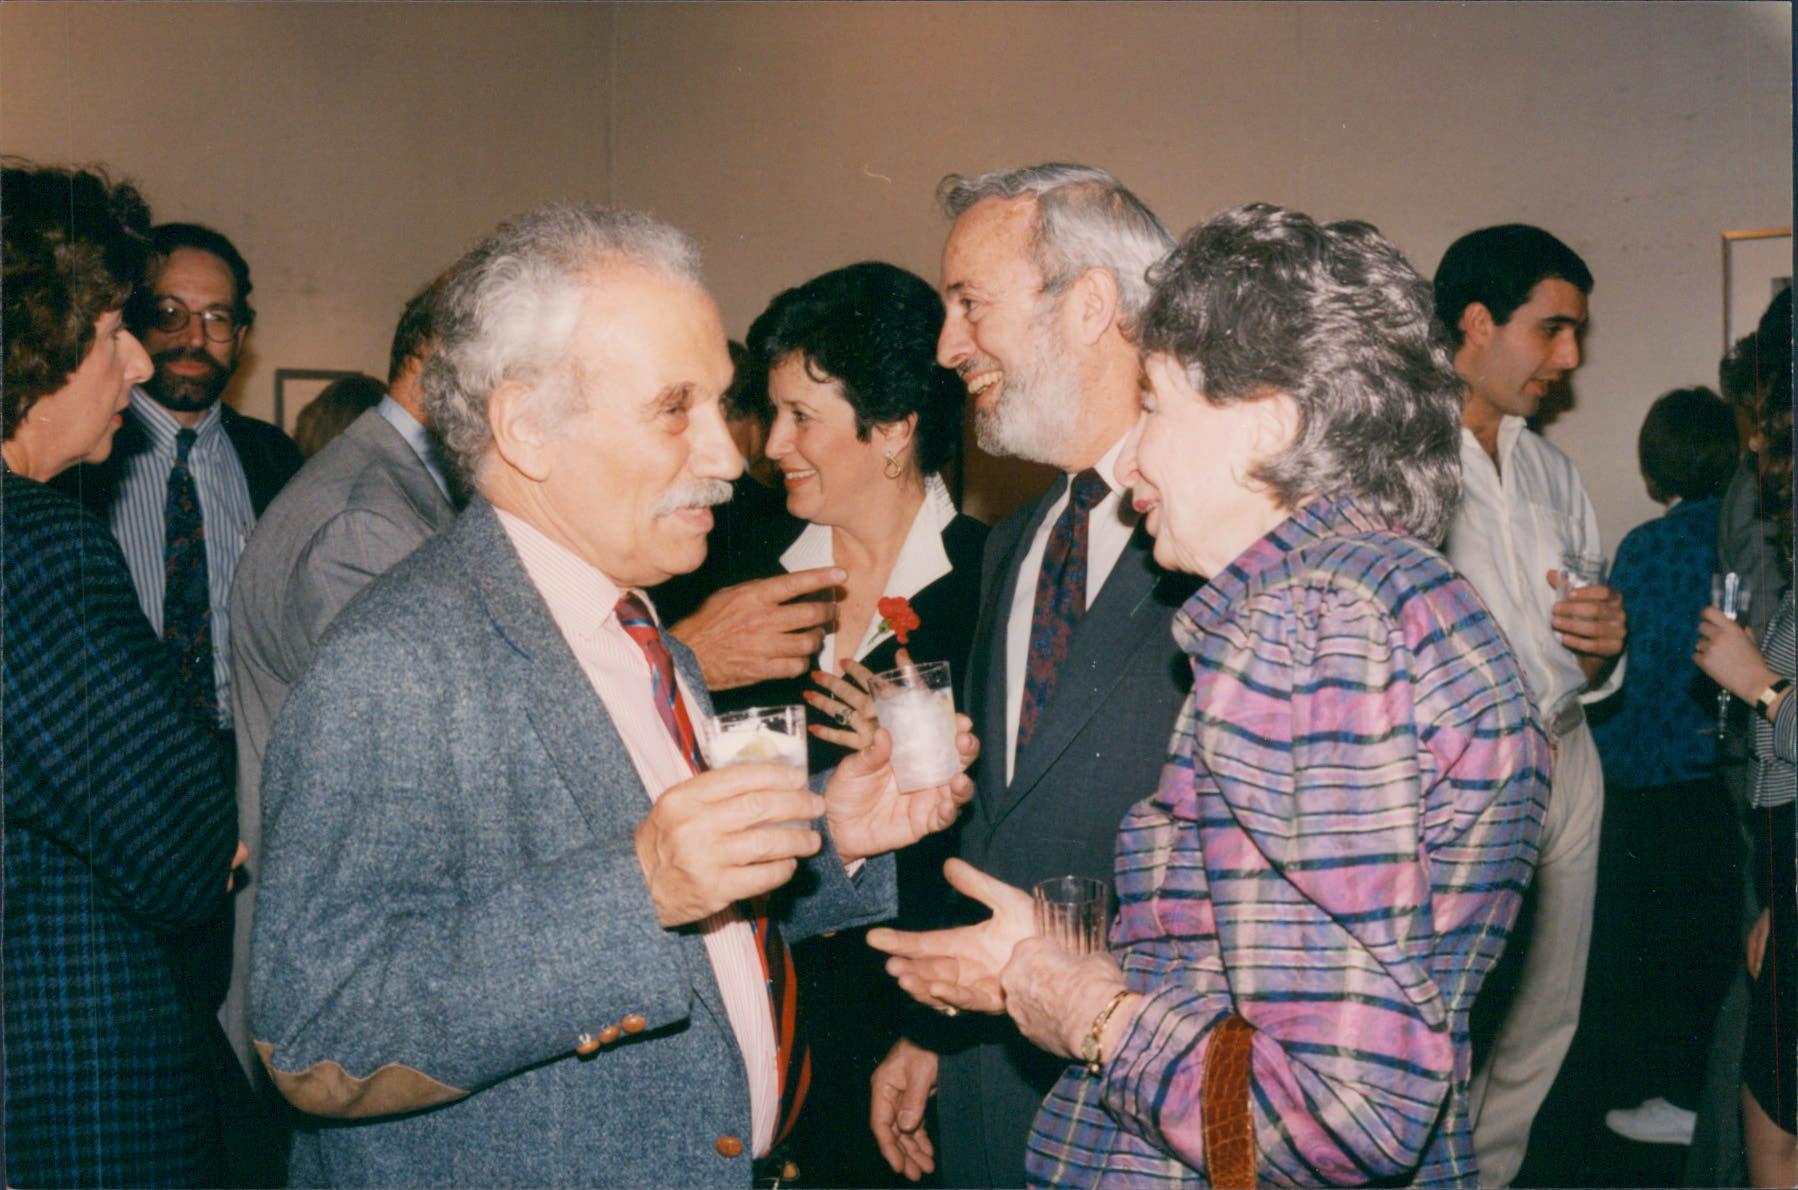 Tobiasse with Yvonne Halsman at Halsman Opening Nahan NY